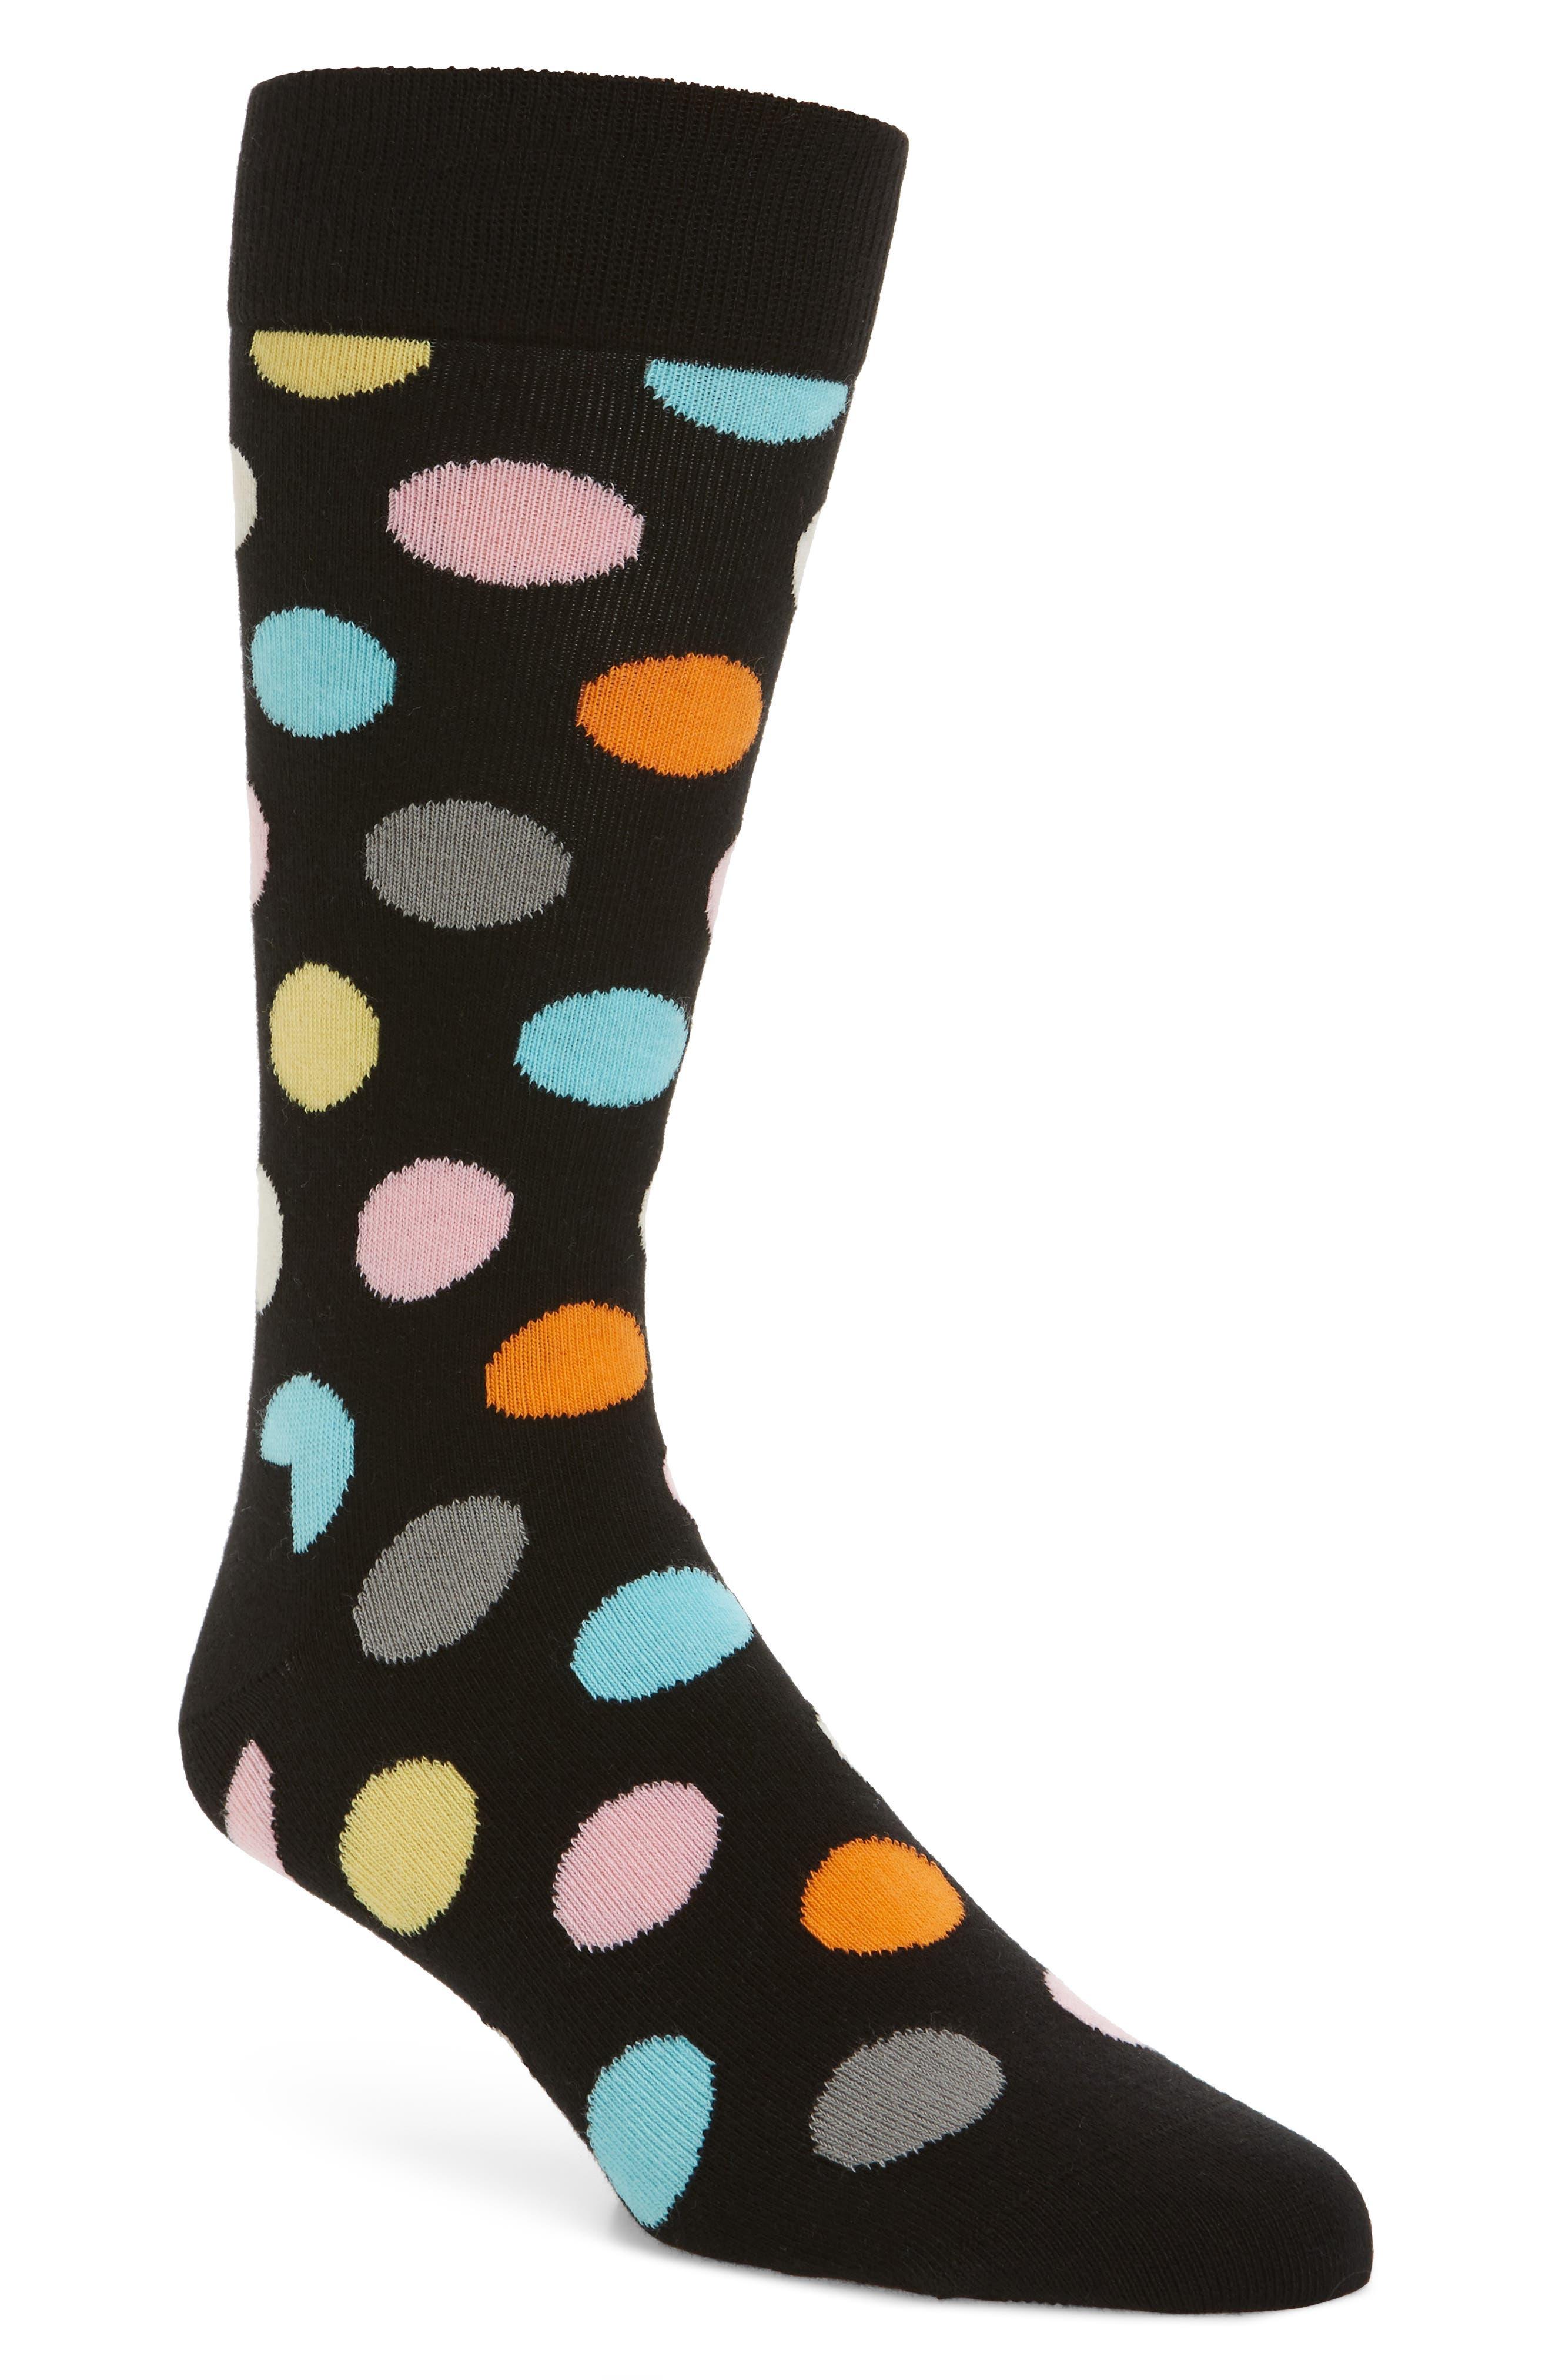 Big Dot Pattern Socks,                         Main,                         color, Black Multi